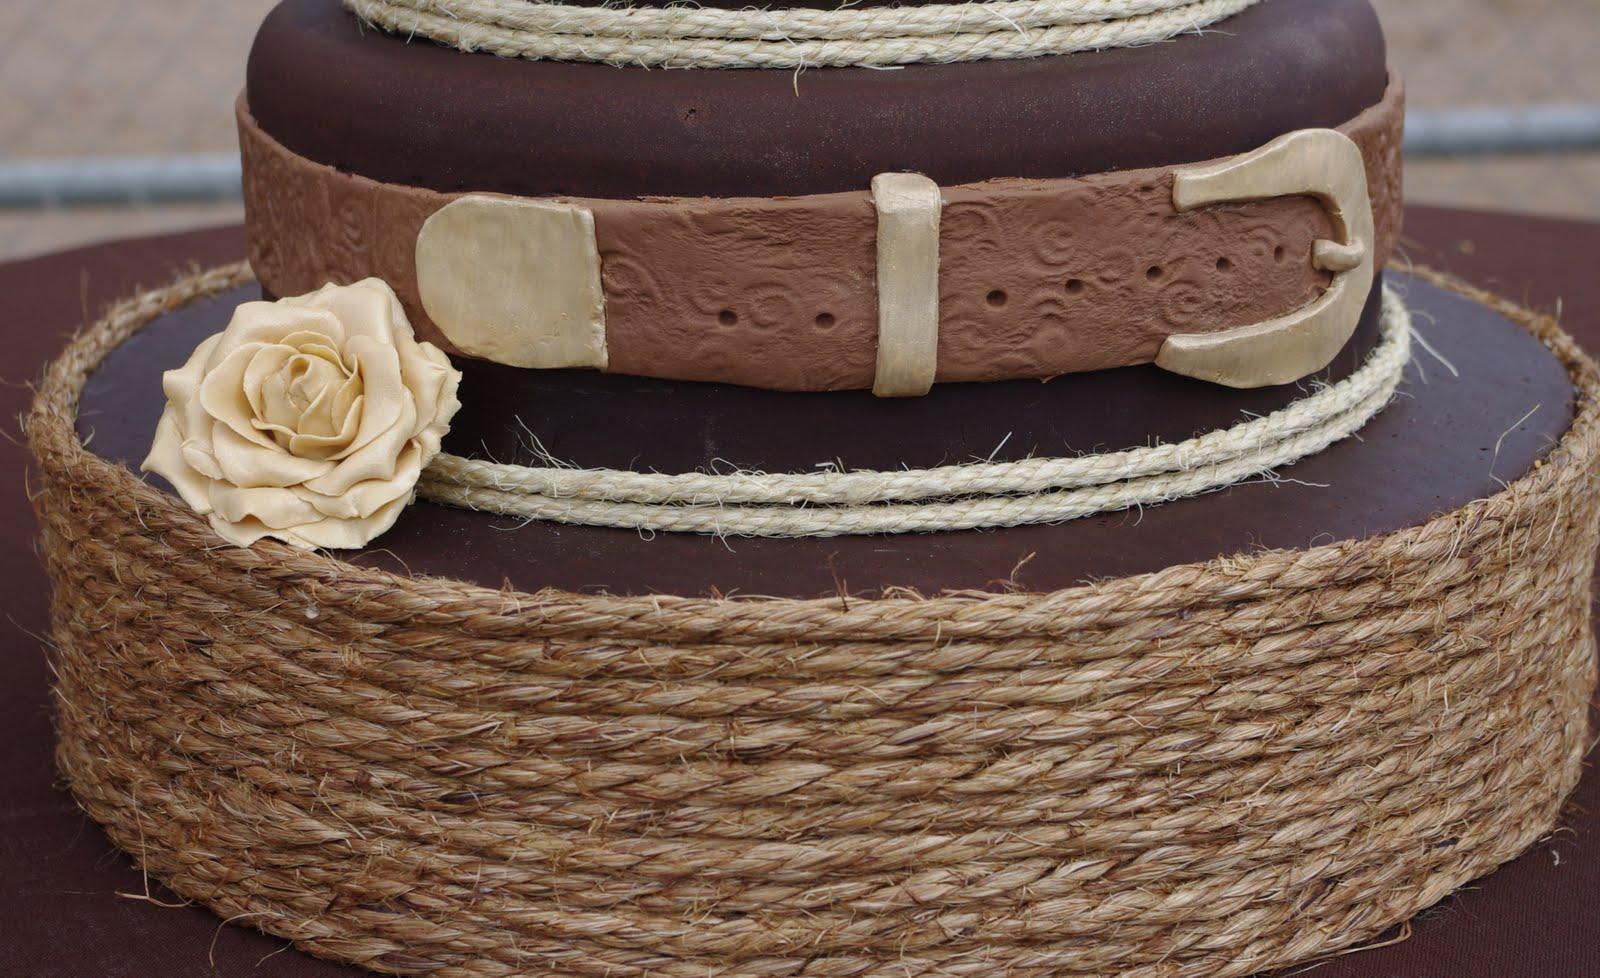 Pin Western Theme 6 Cake on Pinterest